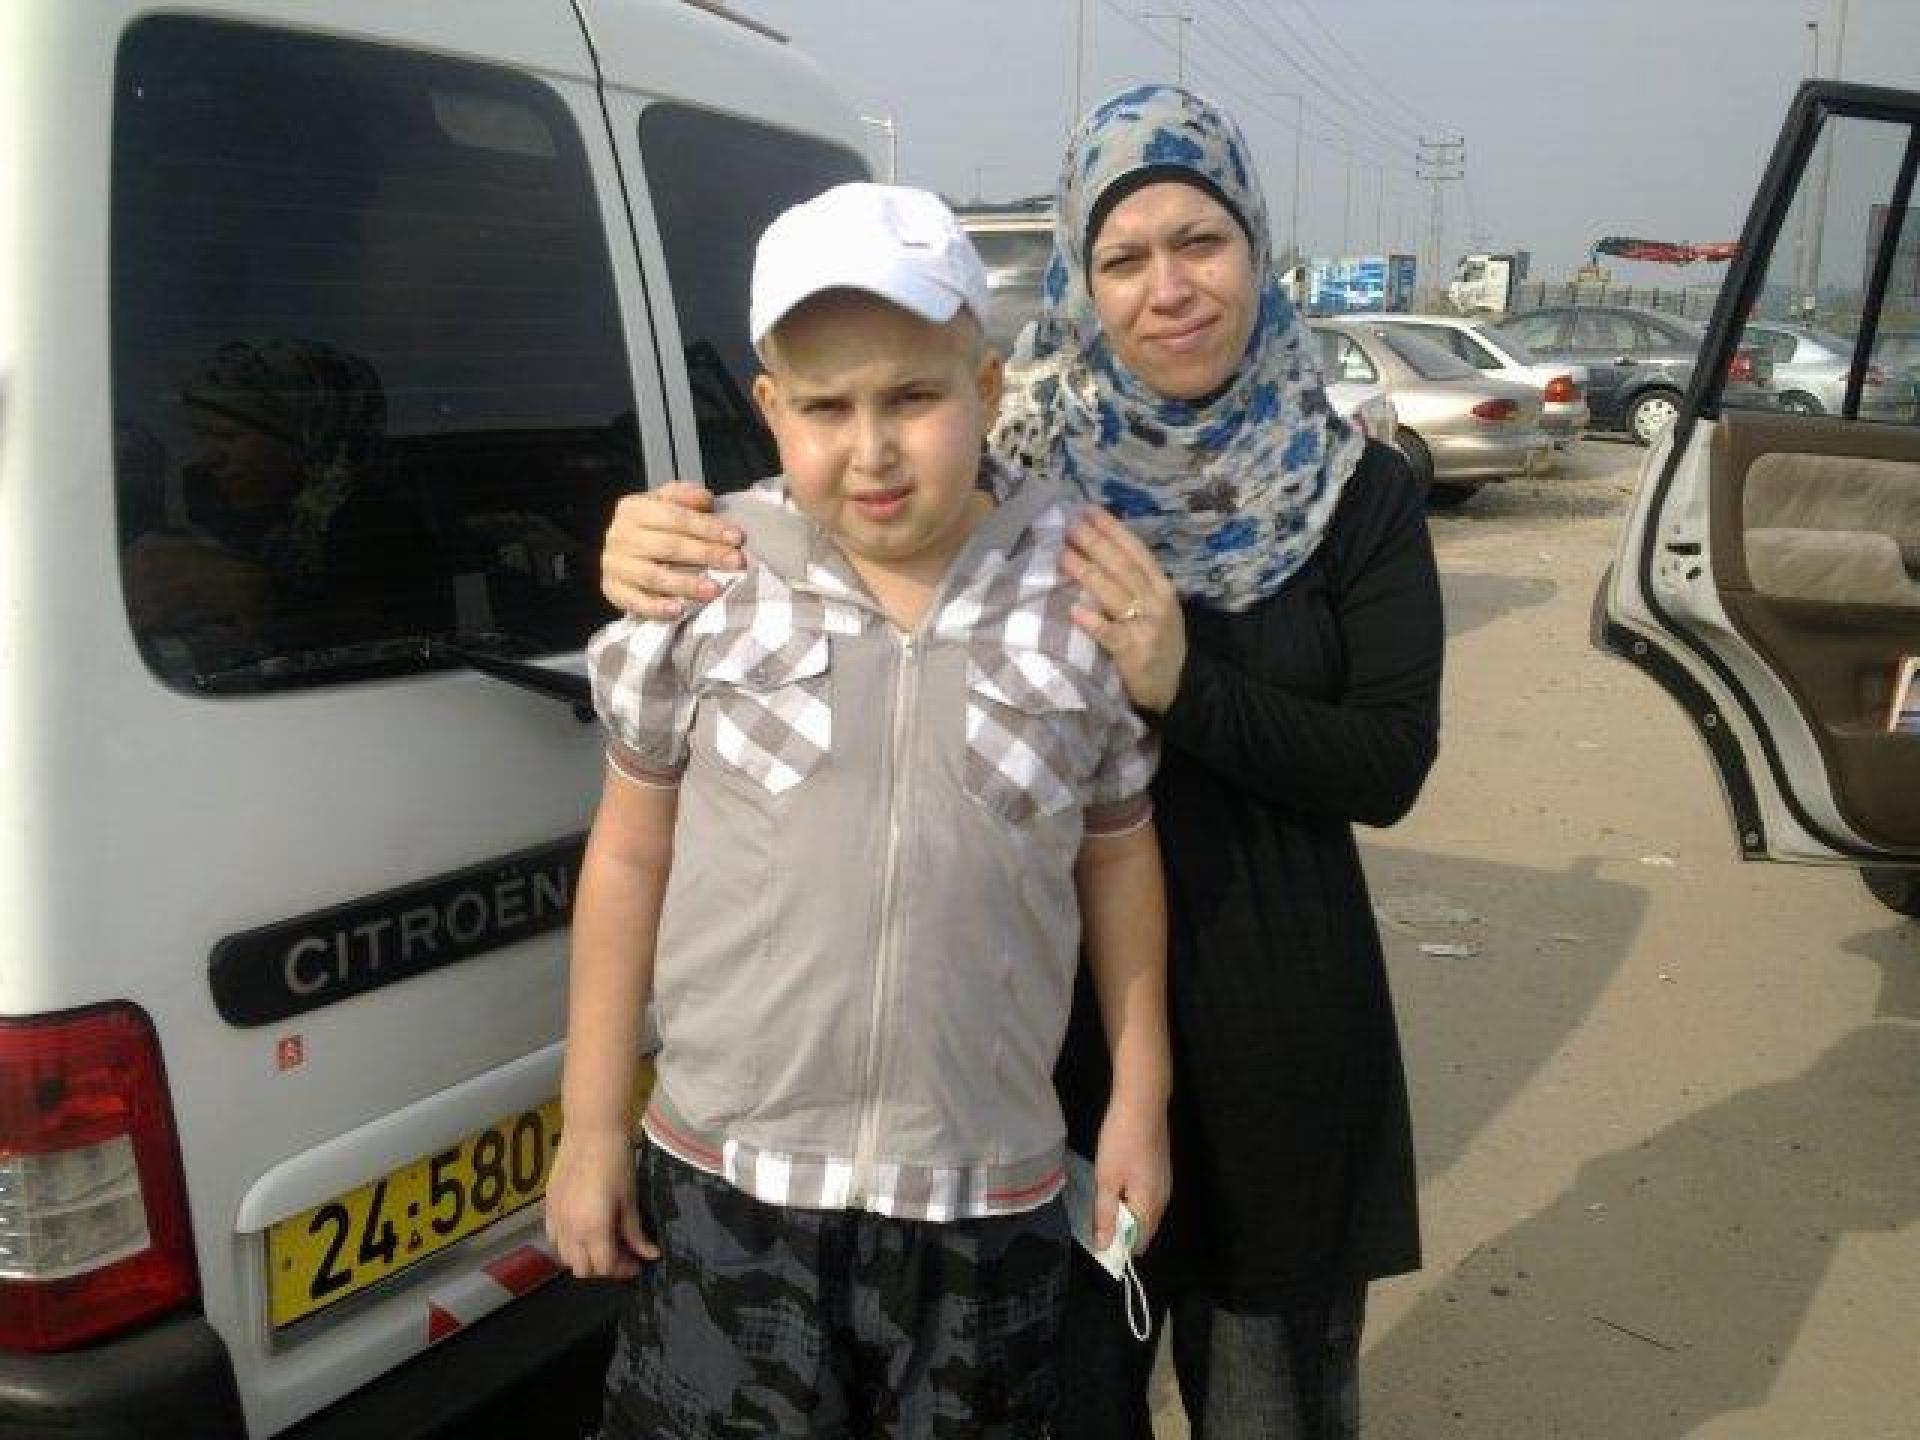 Barta'a/Reikhan checkpoint 23.06.11